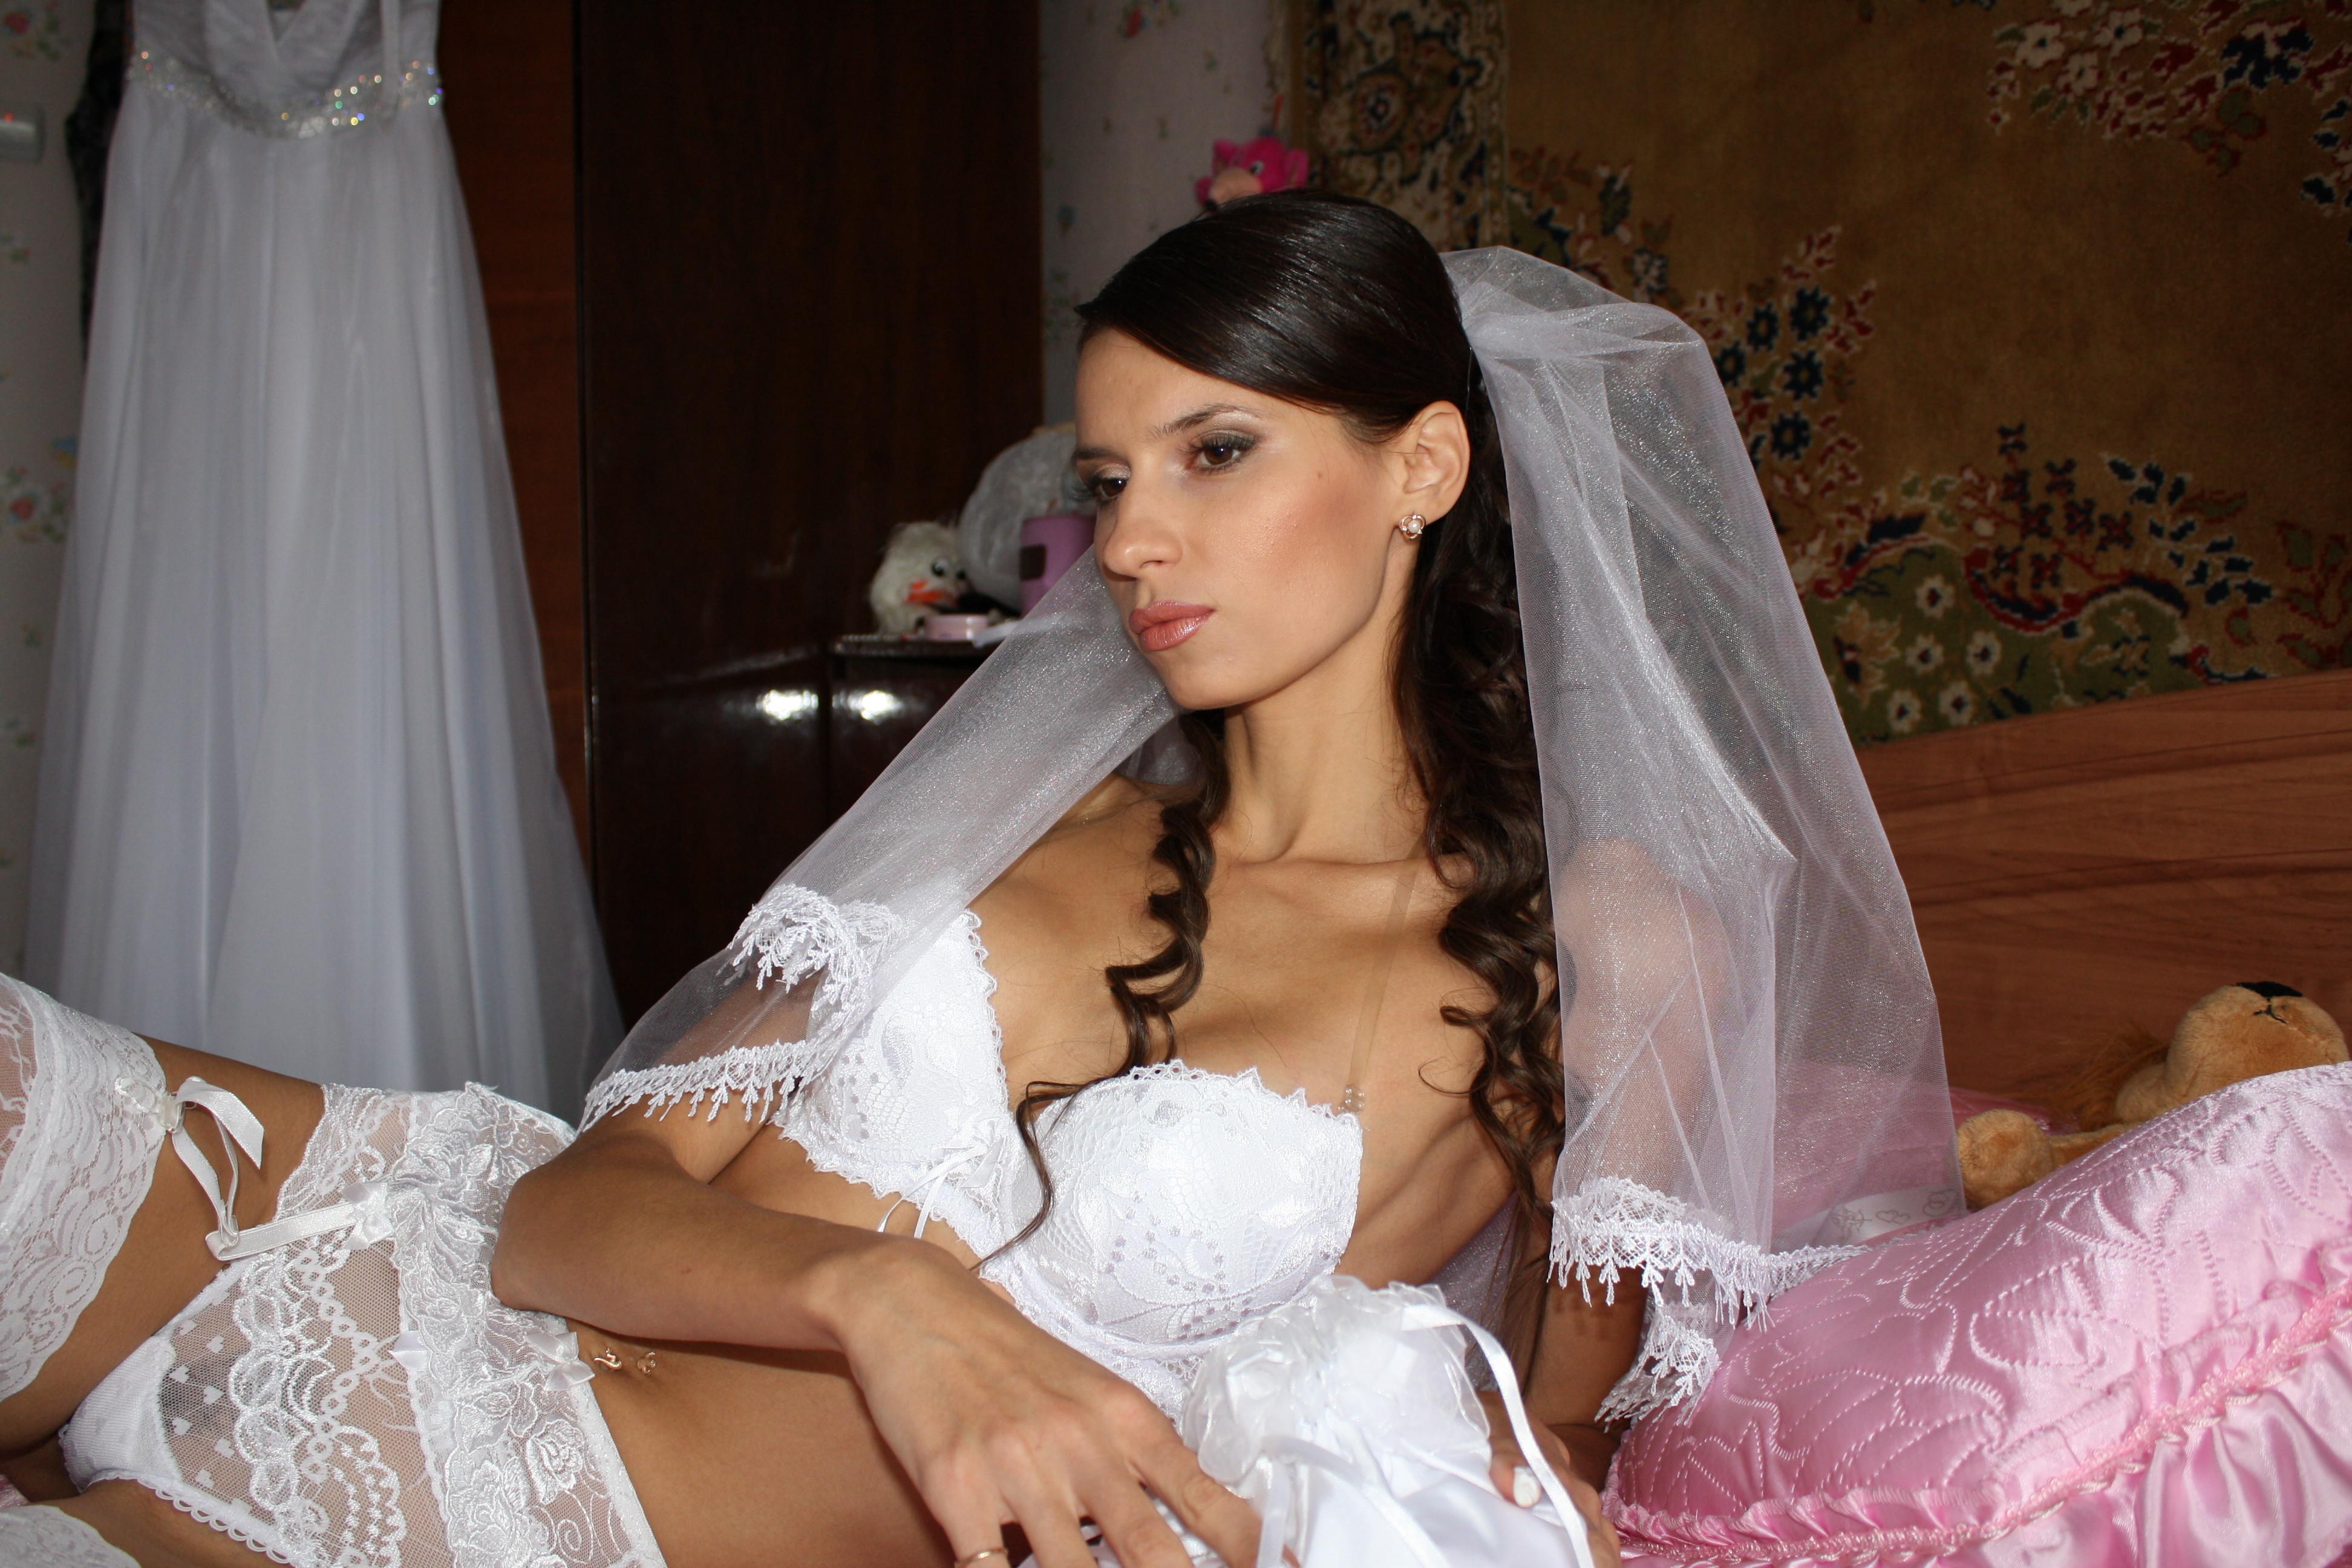 Russian dating website pics